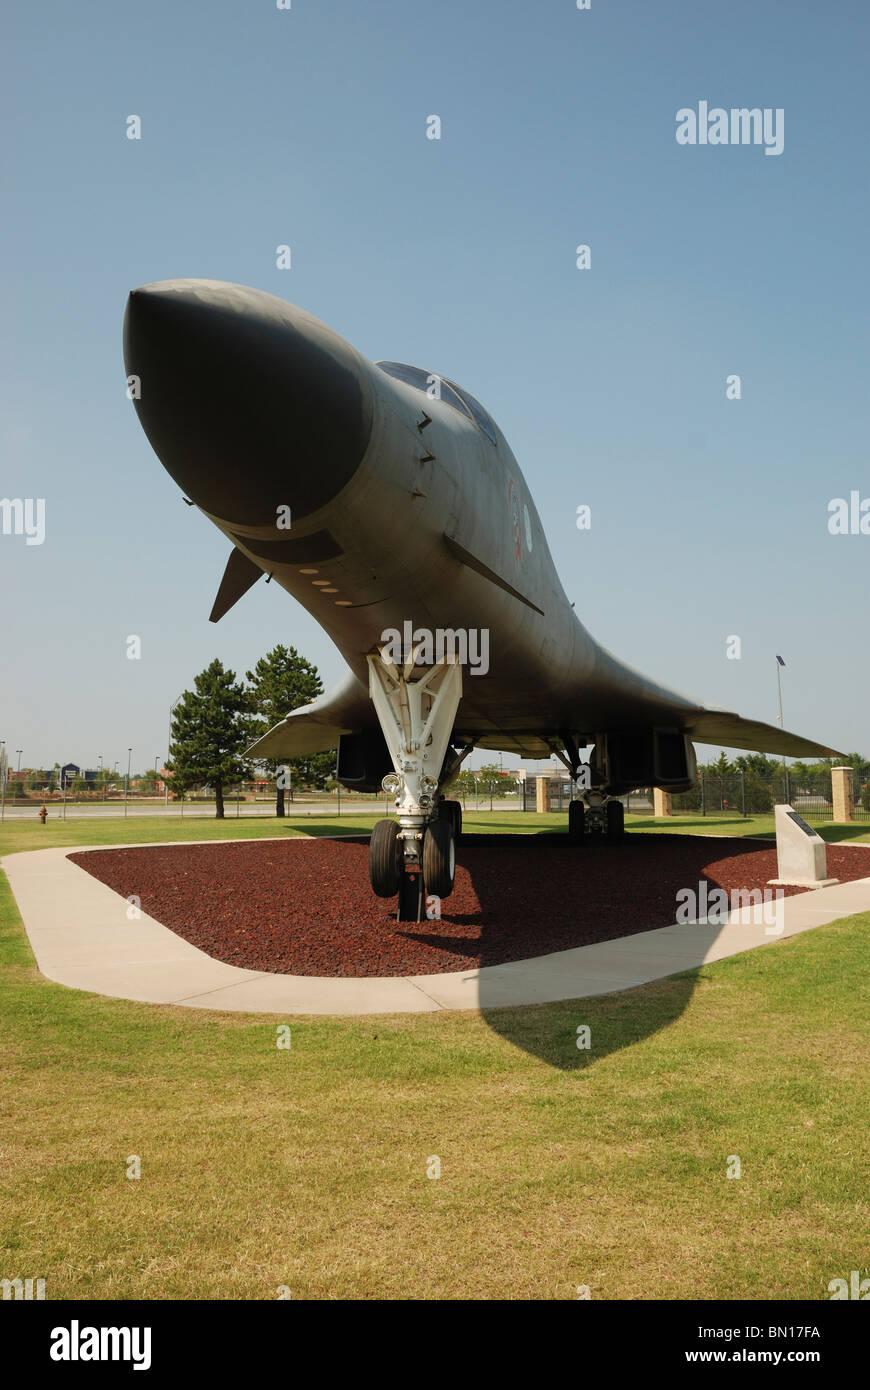 A B1-B 'Lancer' bomber aircraft on display at the Tinker Air Force Base, Oklahoma City, Oklahoma, USA. Stock Photo